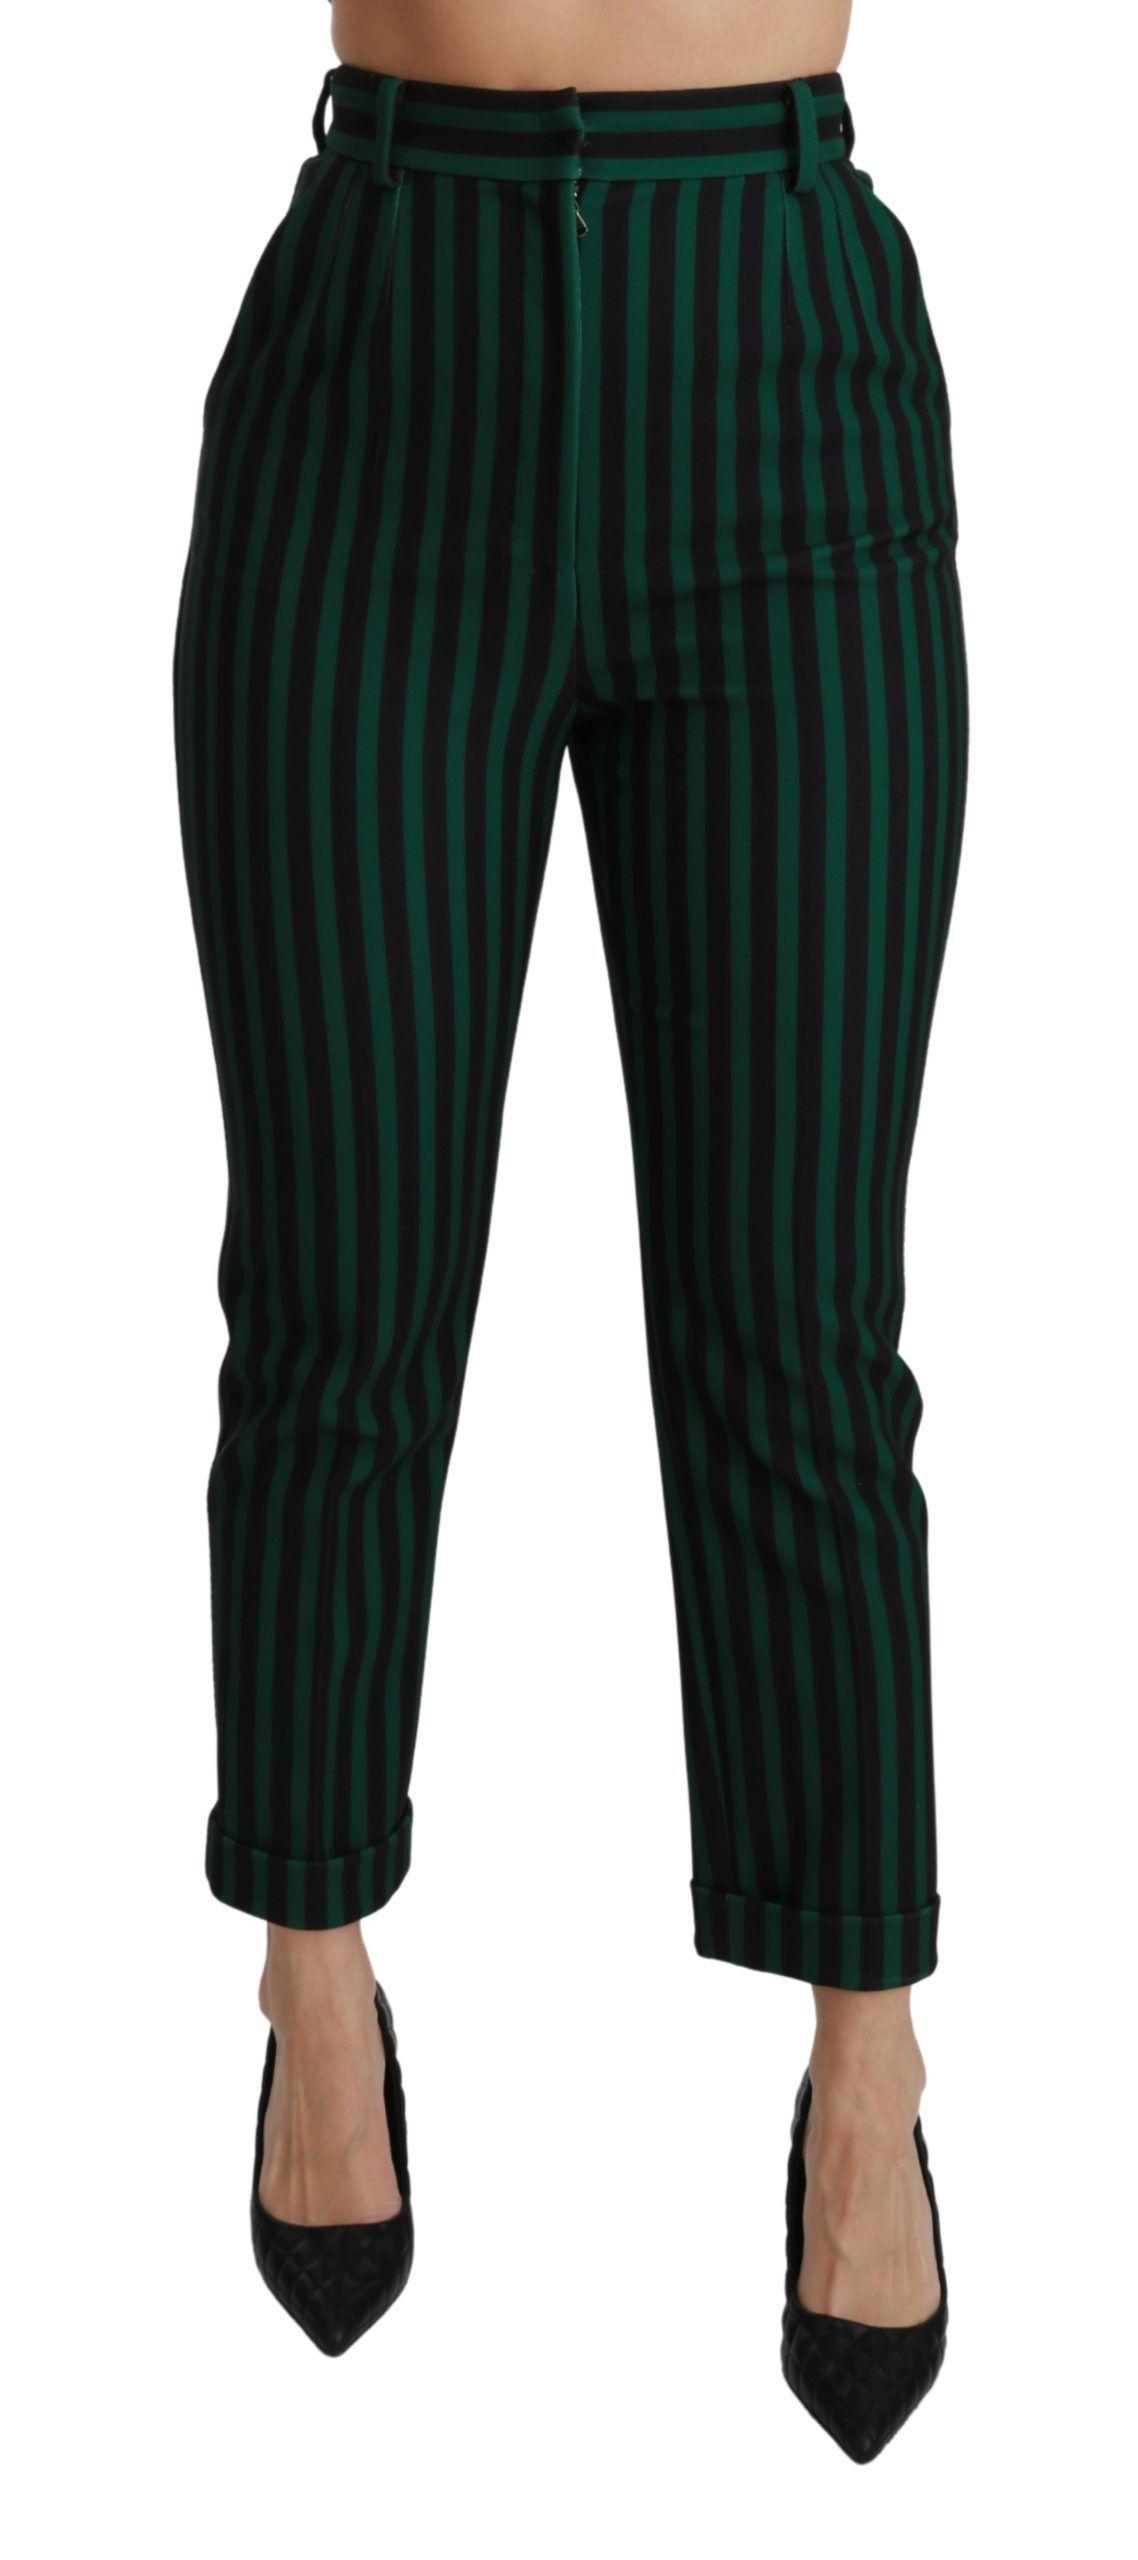 Black Green Striped High Waist Trouser Pants   IT40 S Gallery